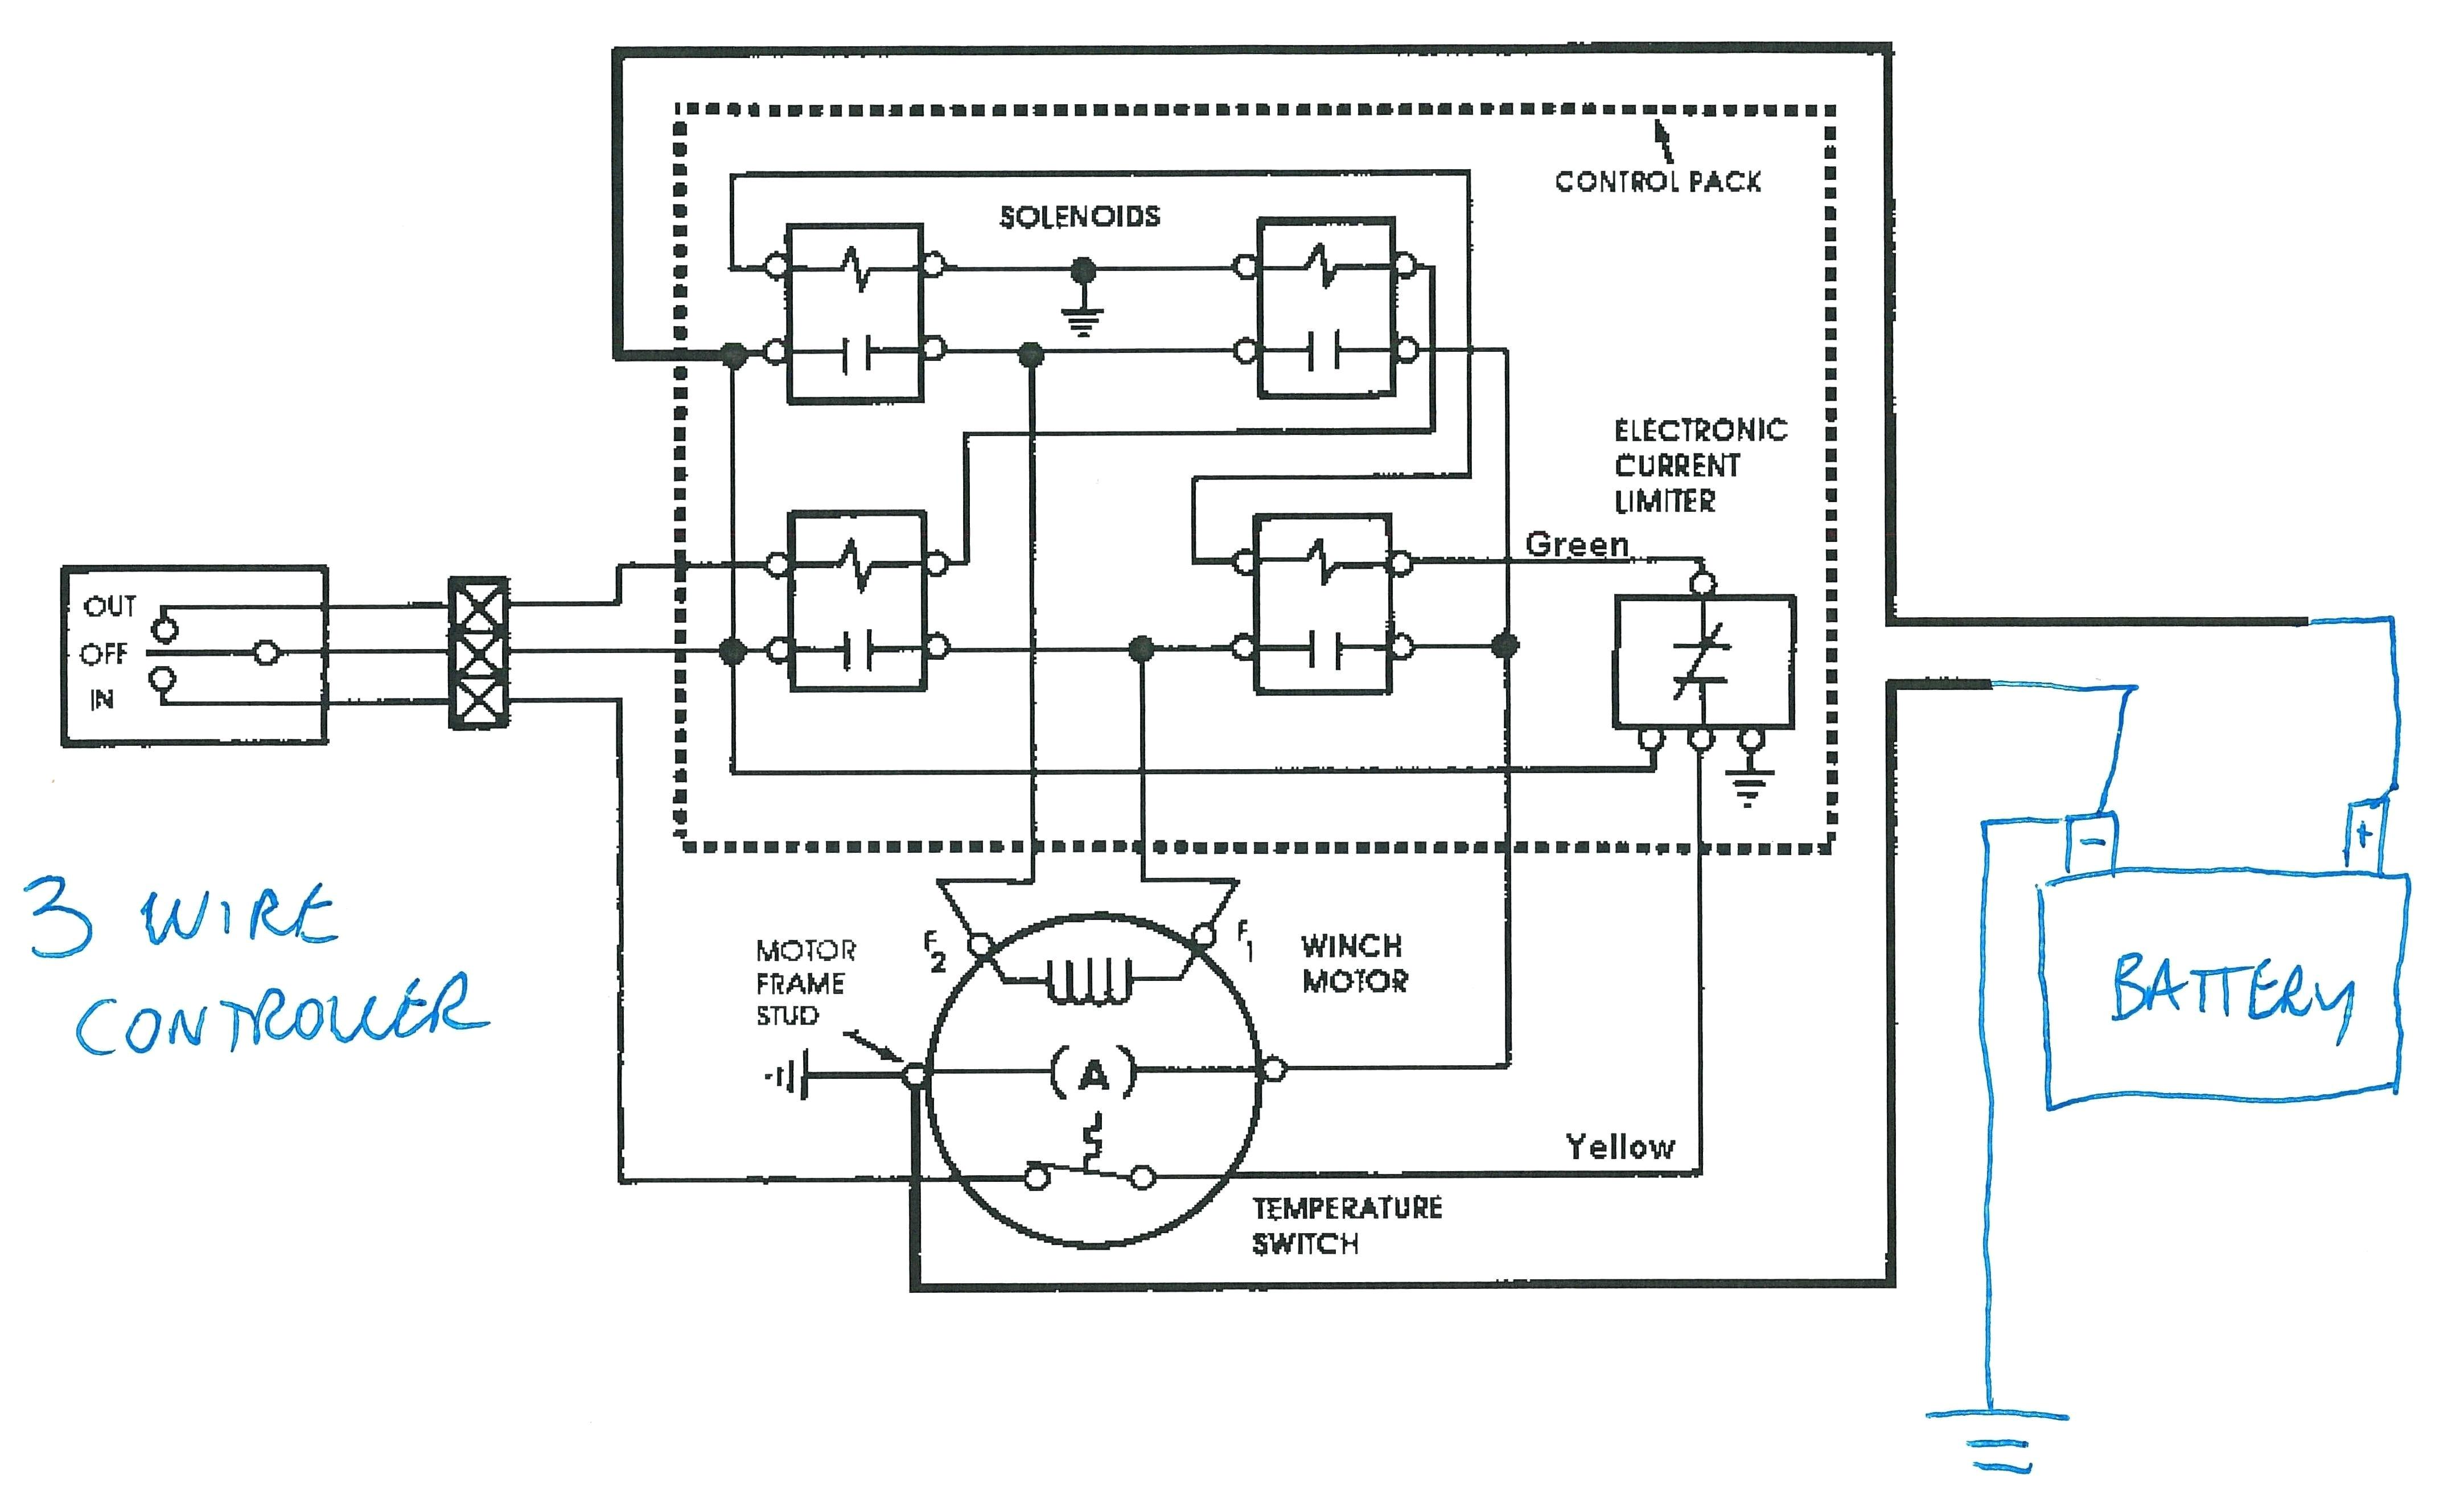 warn winch switch wiring wiring diagram used warn atv winch switch wiring diagram warn switch wiring diagram